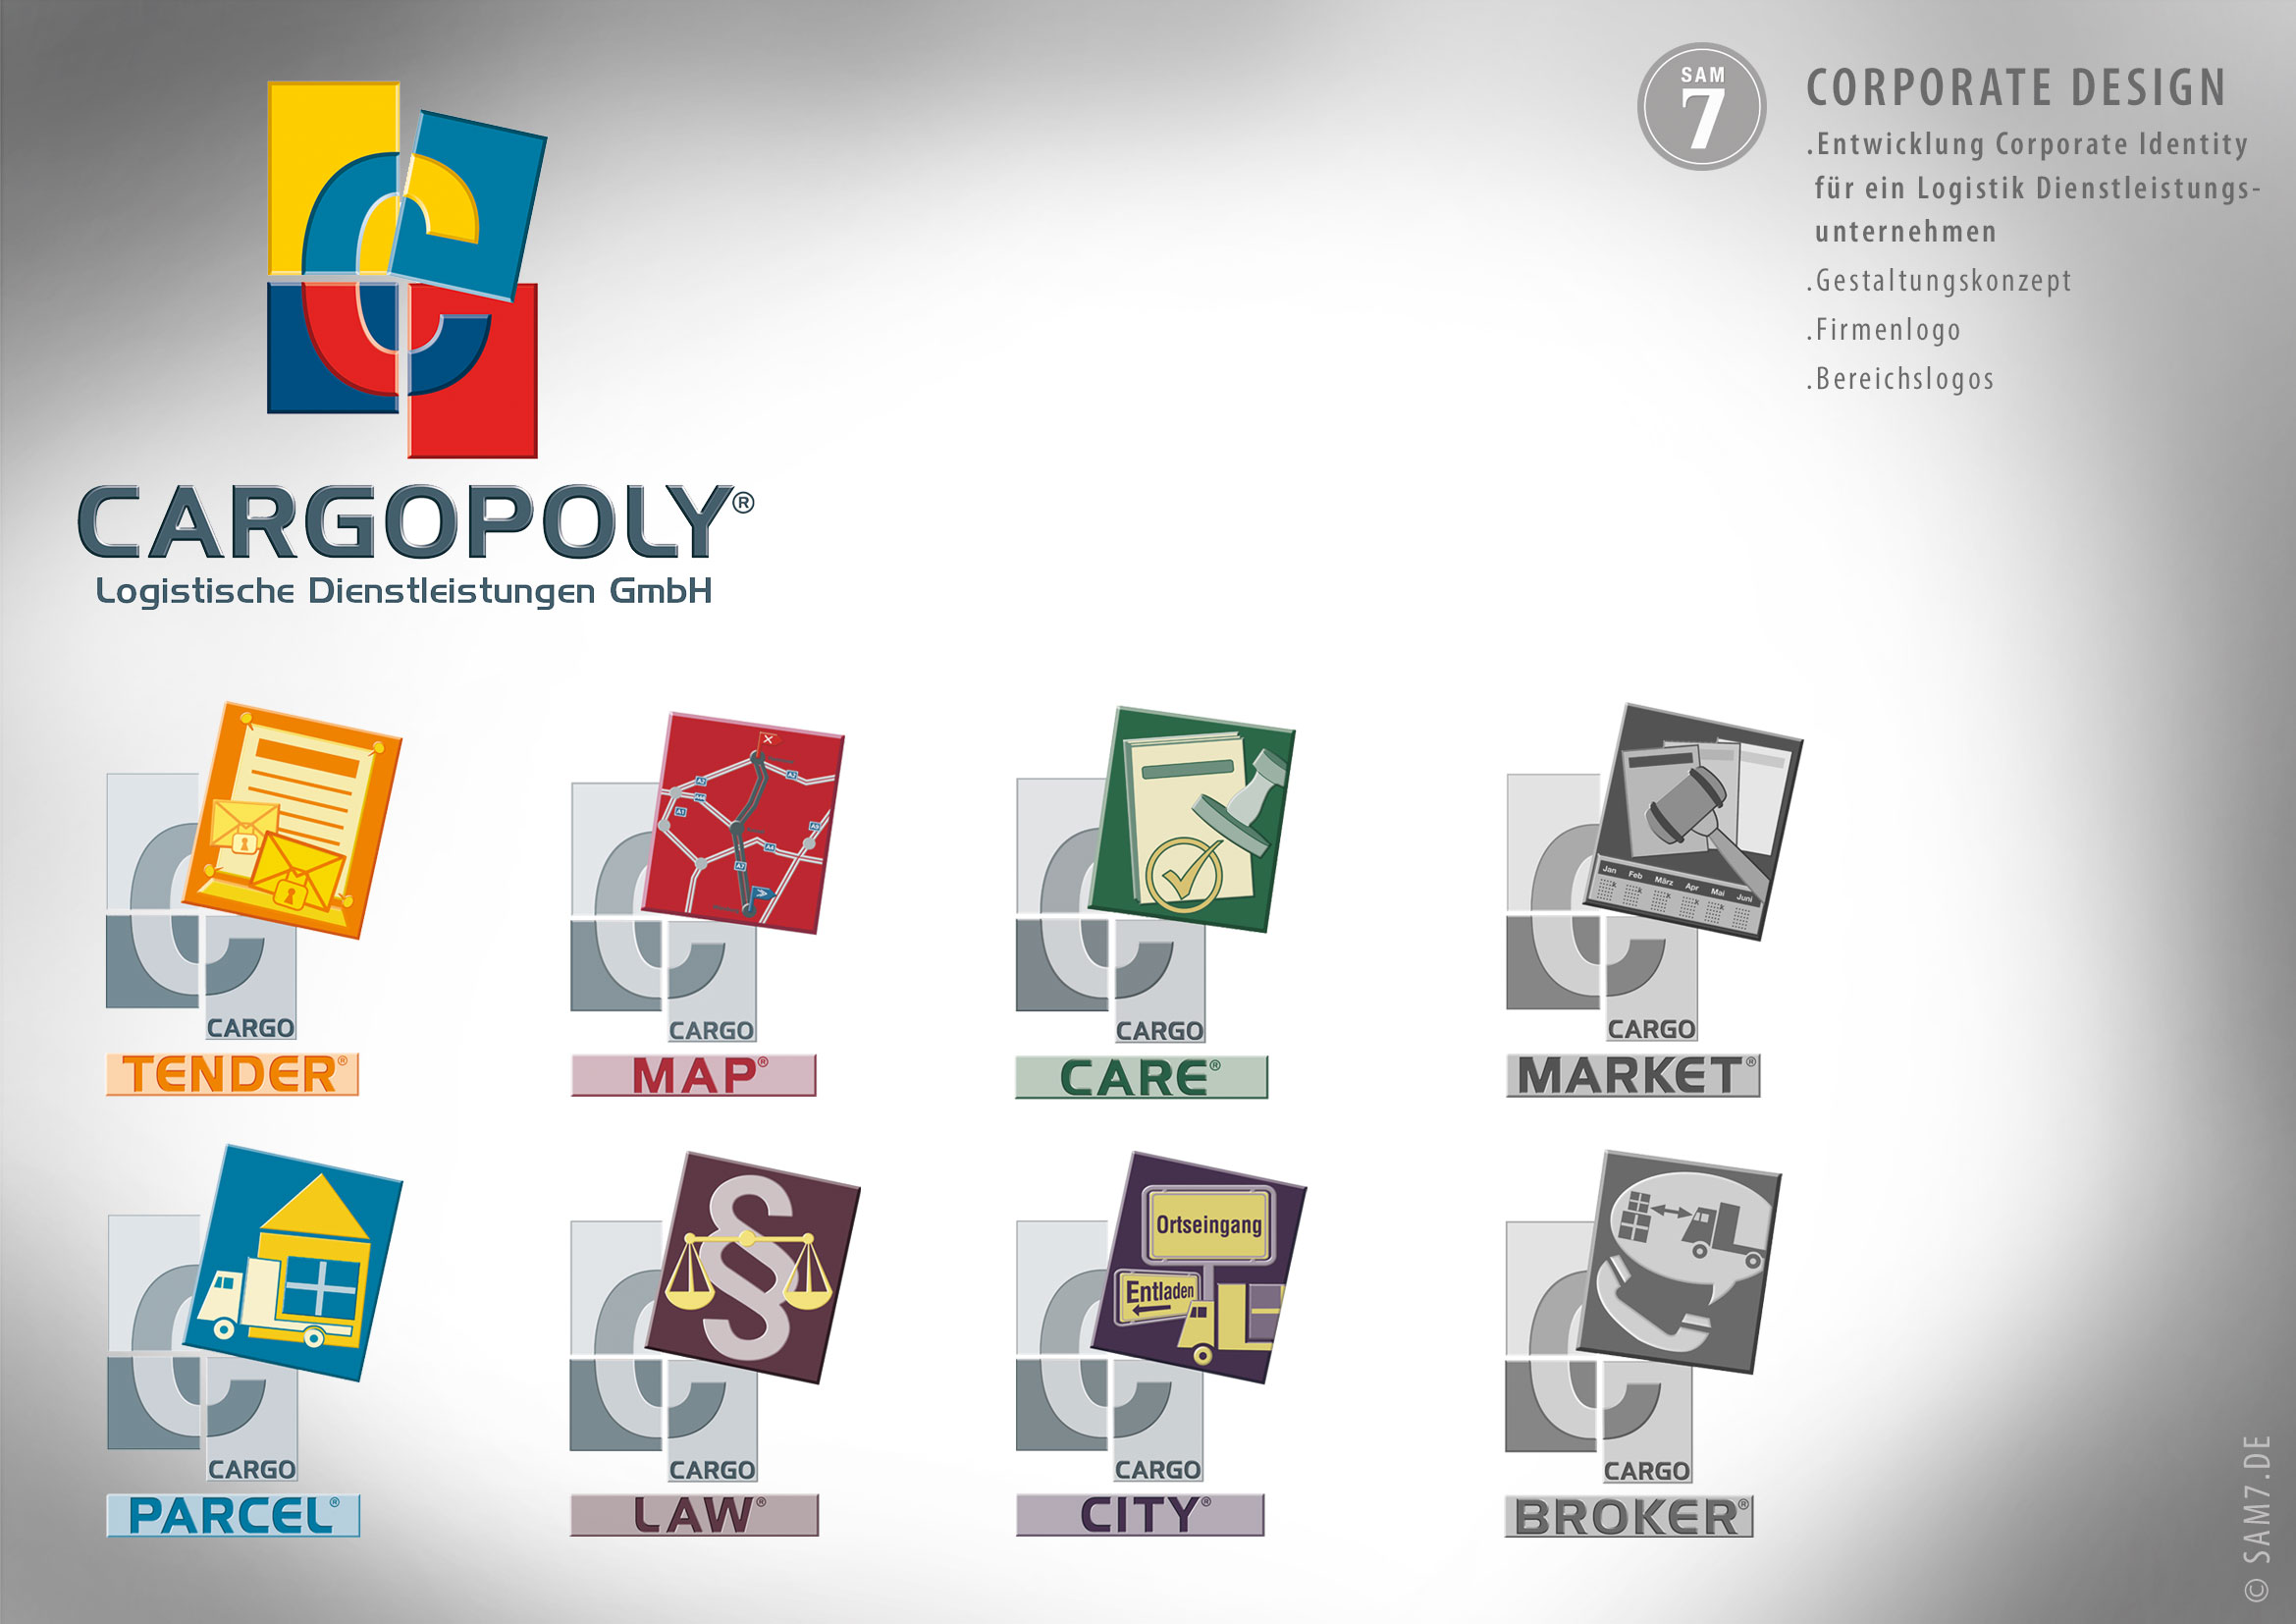 Corporate Design. Cargopoly®.